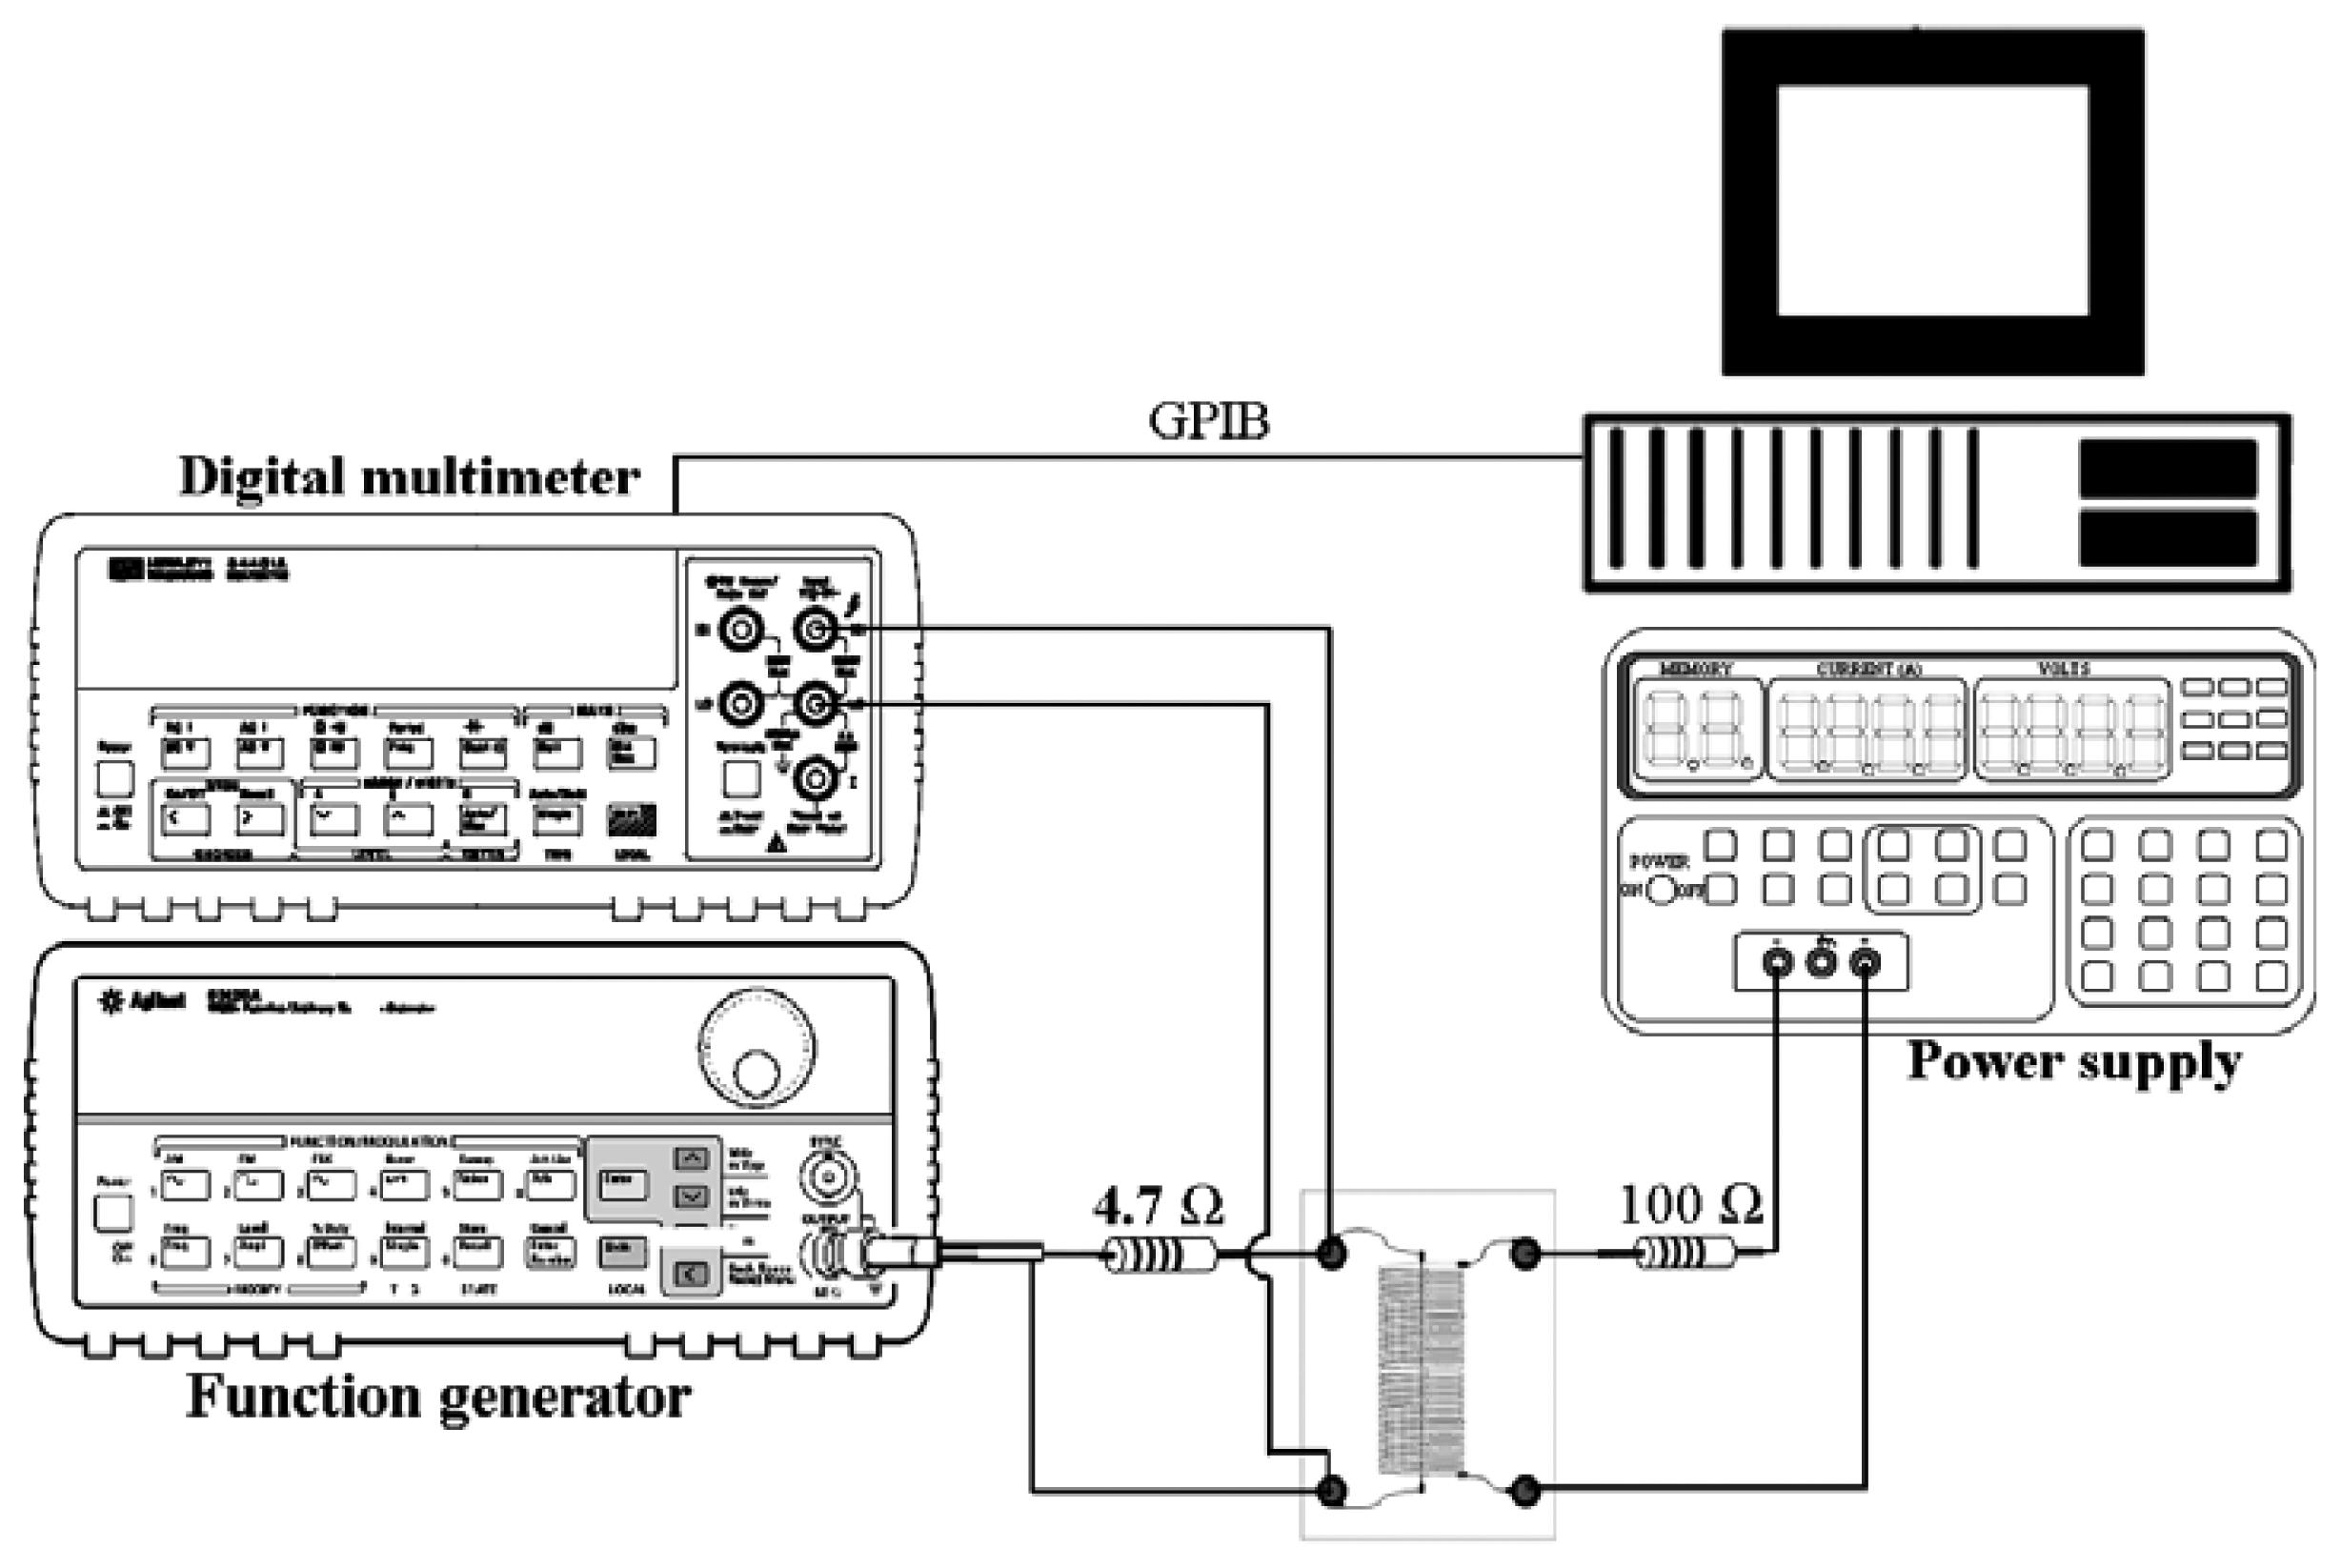 Sensors | Free Full-Text | Low-cost Sensors Based on the GMI ...